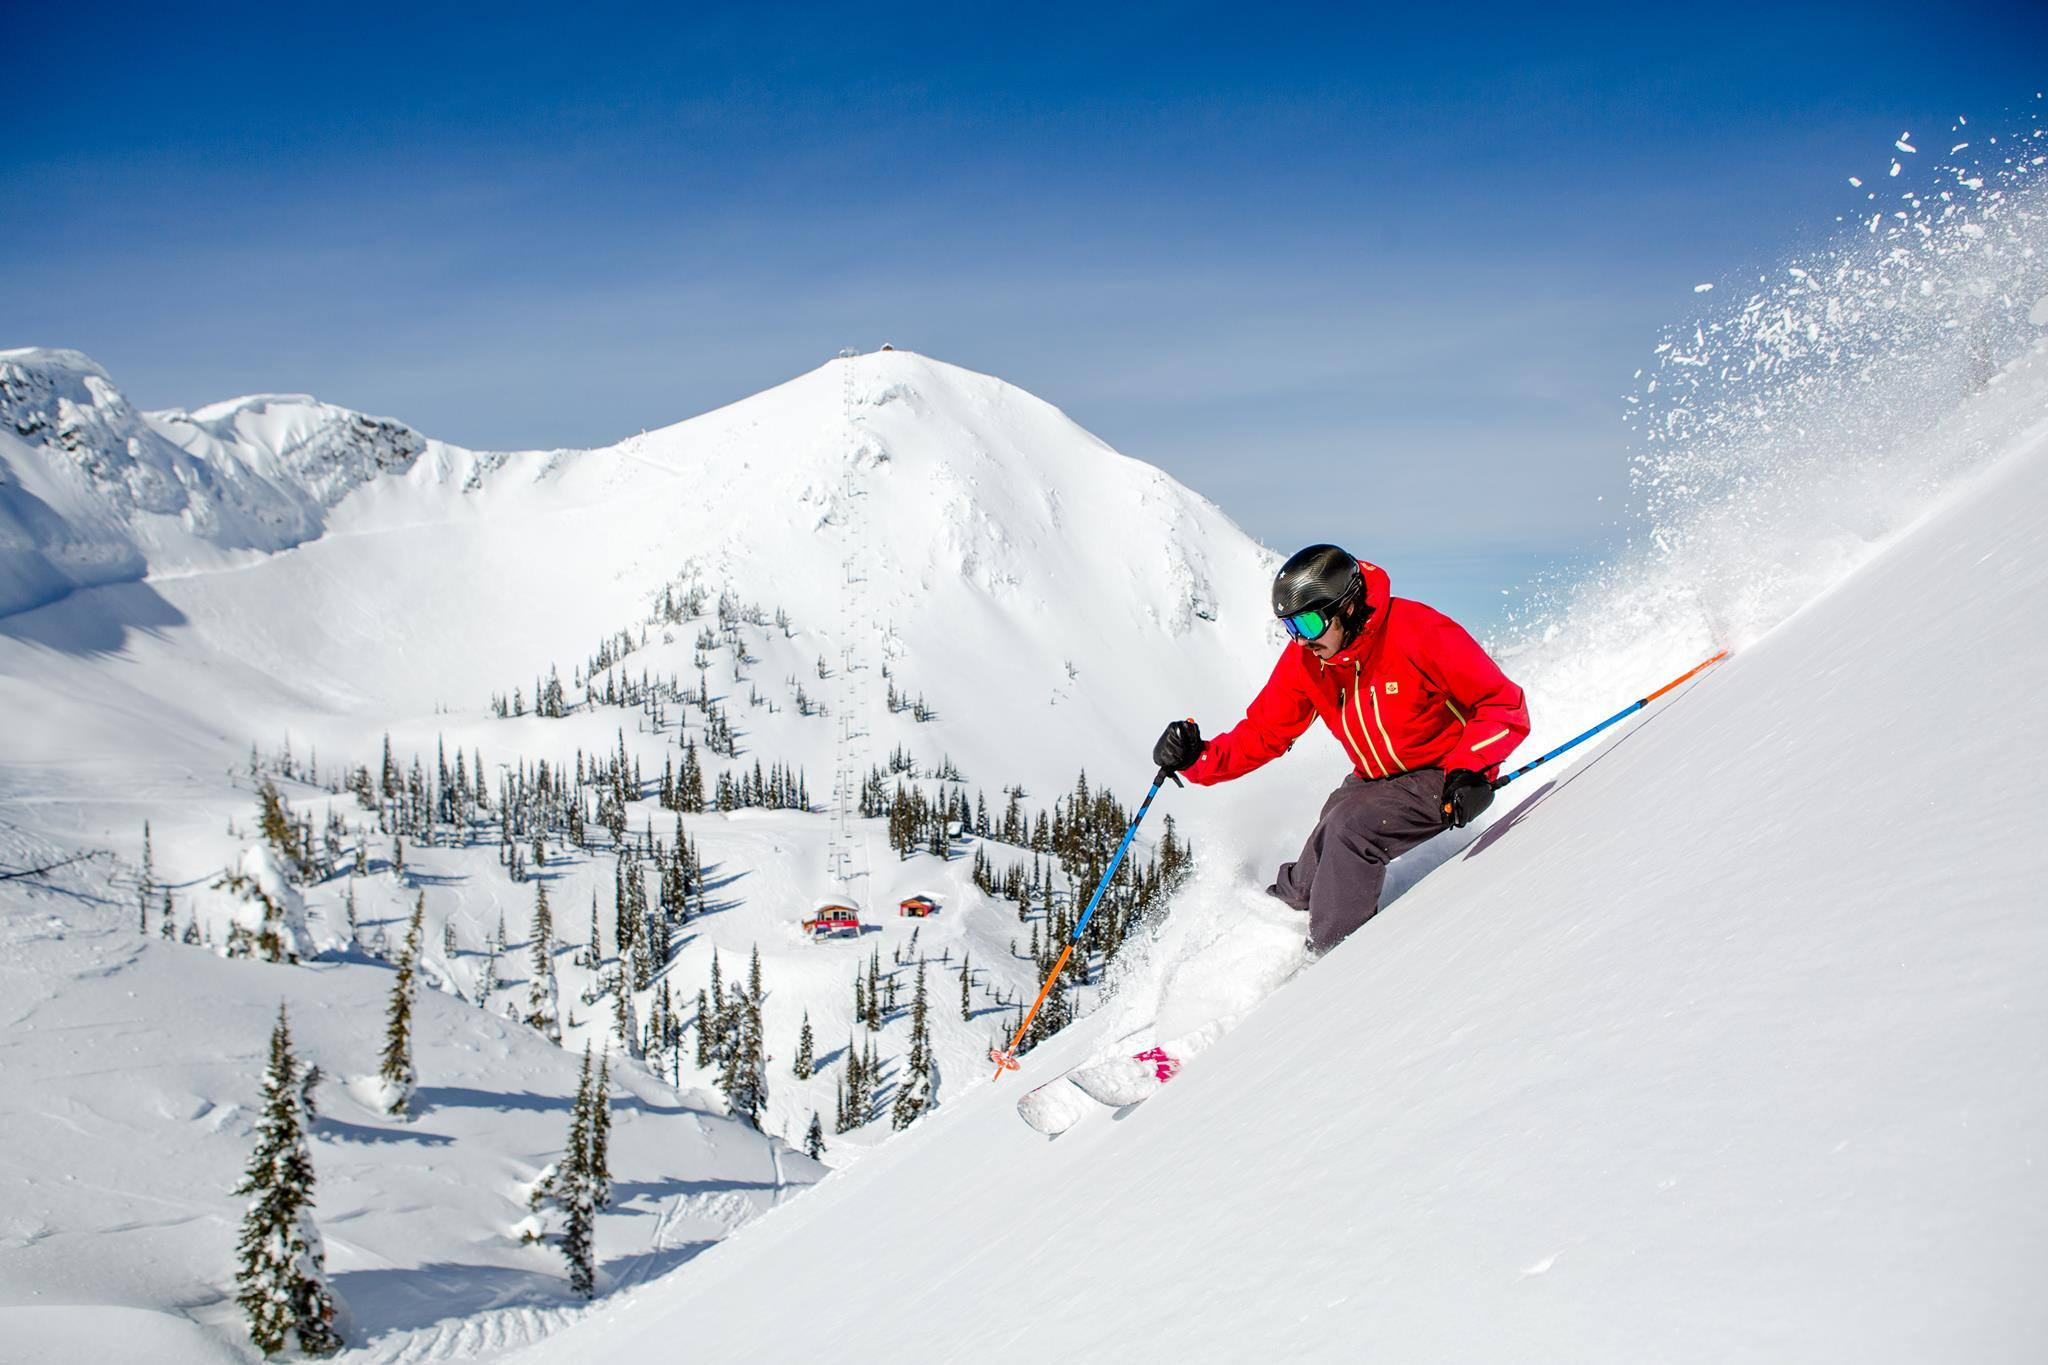 Champagne Snow skiing at Fernie Alpine Resort, Fernie, BC, Canada